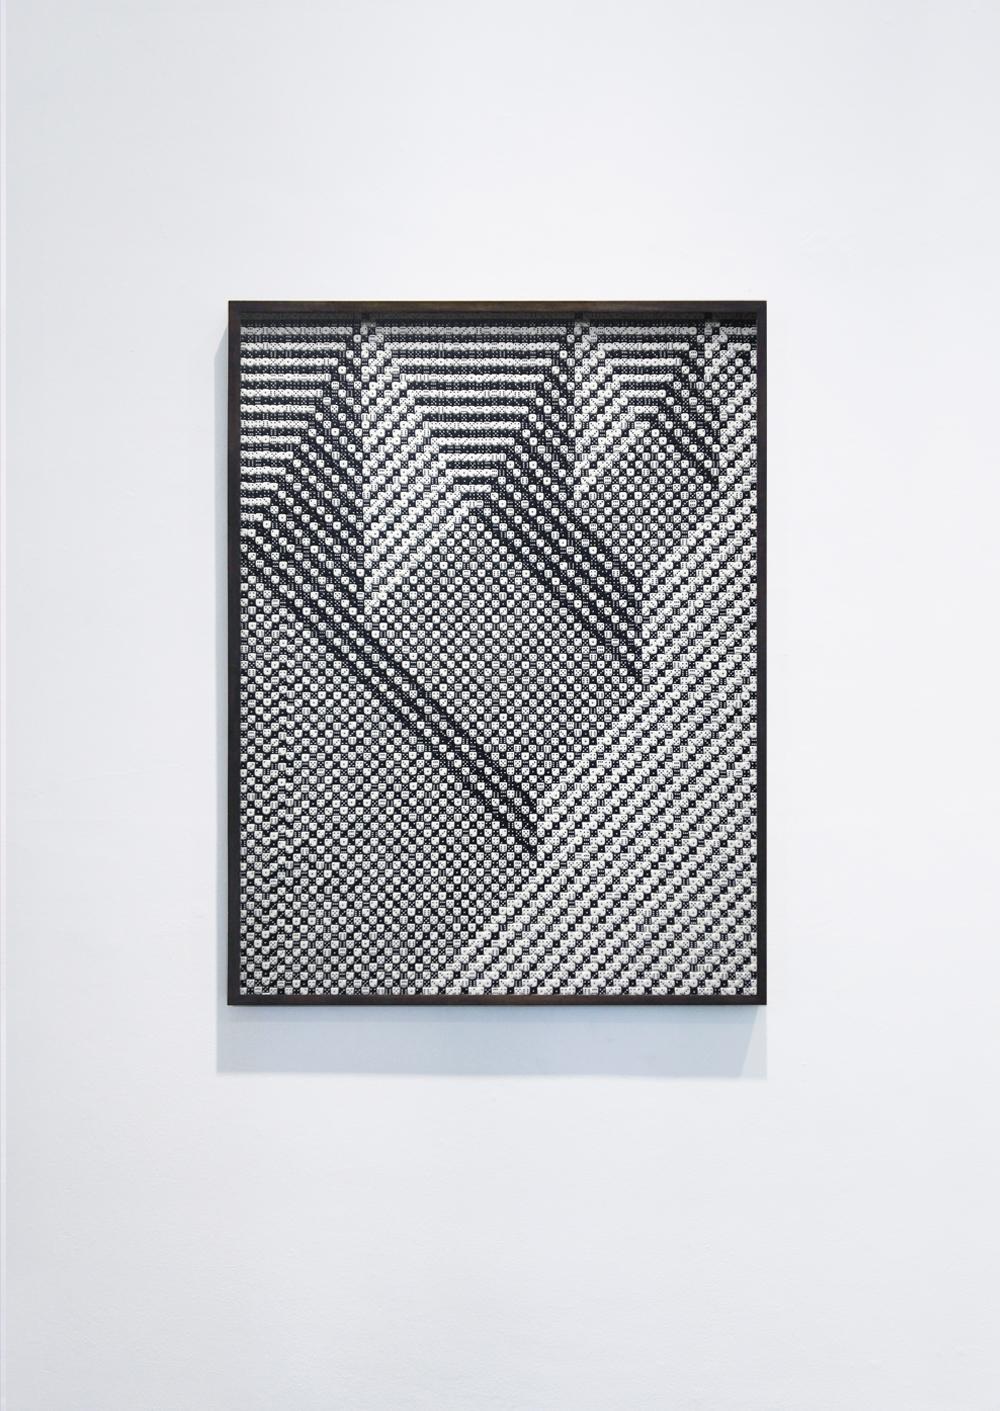 'Hierophany', 2013 | Troika (Conny Freyer, Eva Rucki, Sebastien Noel)